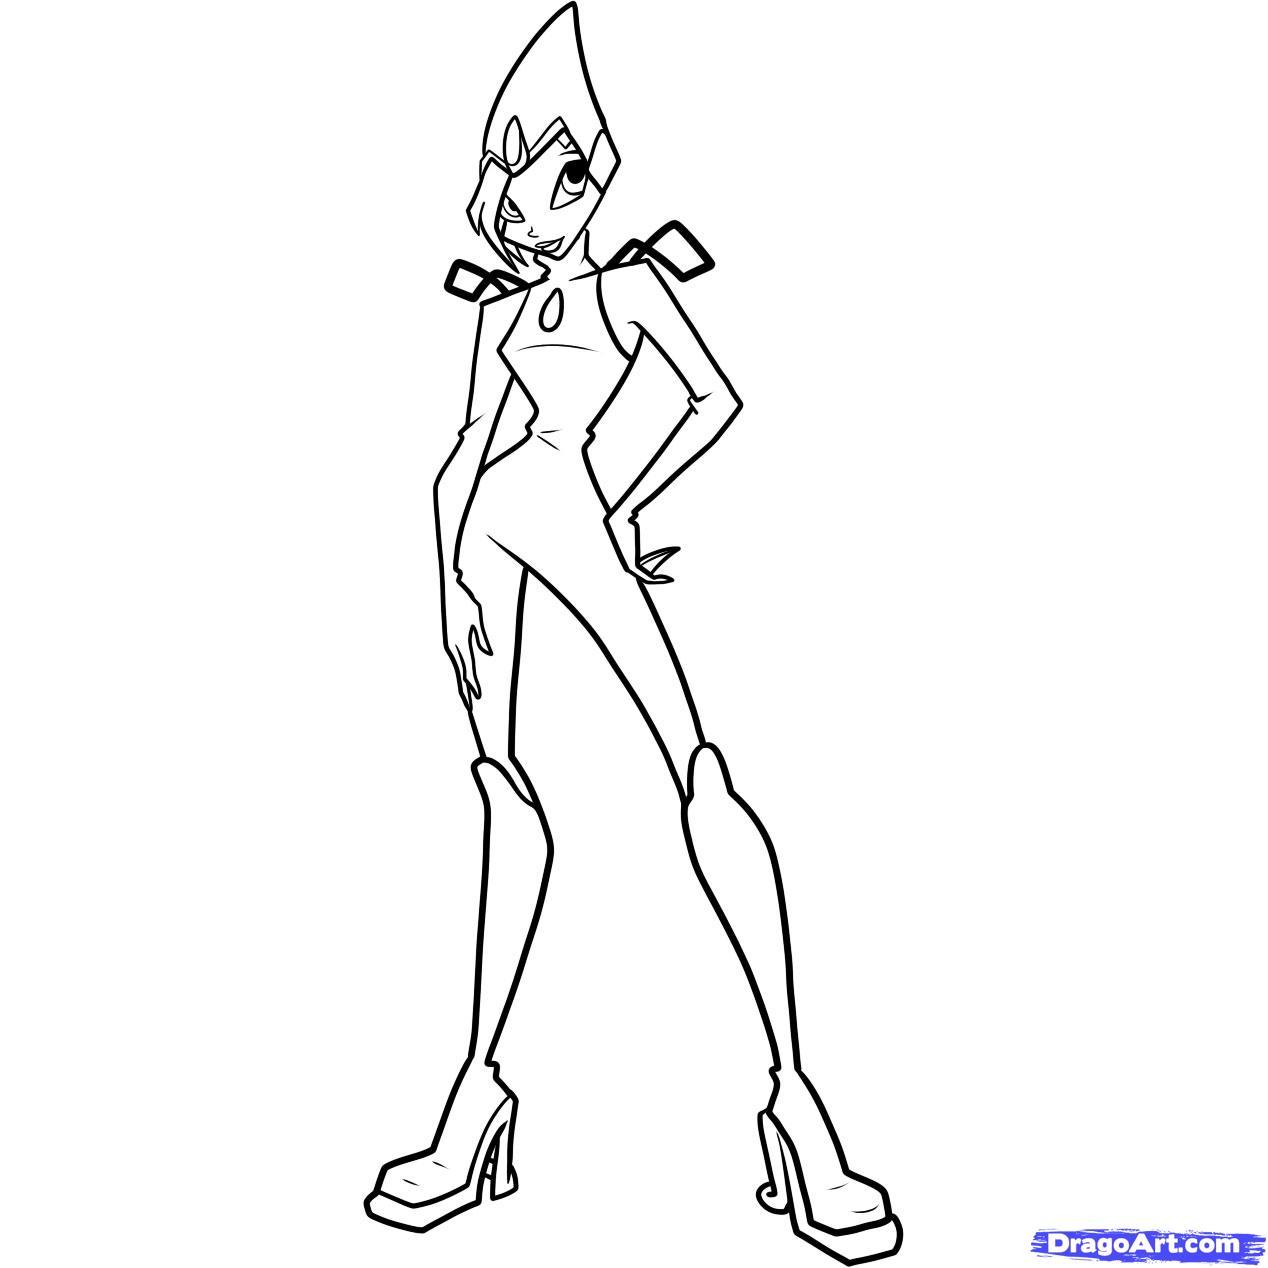 Рисуем Текну из мультфильма Winx - шаг 11